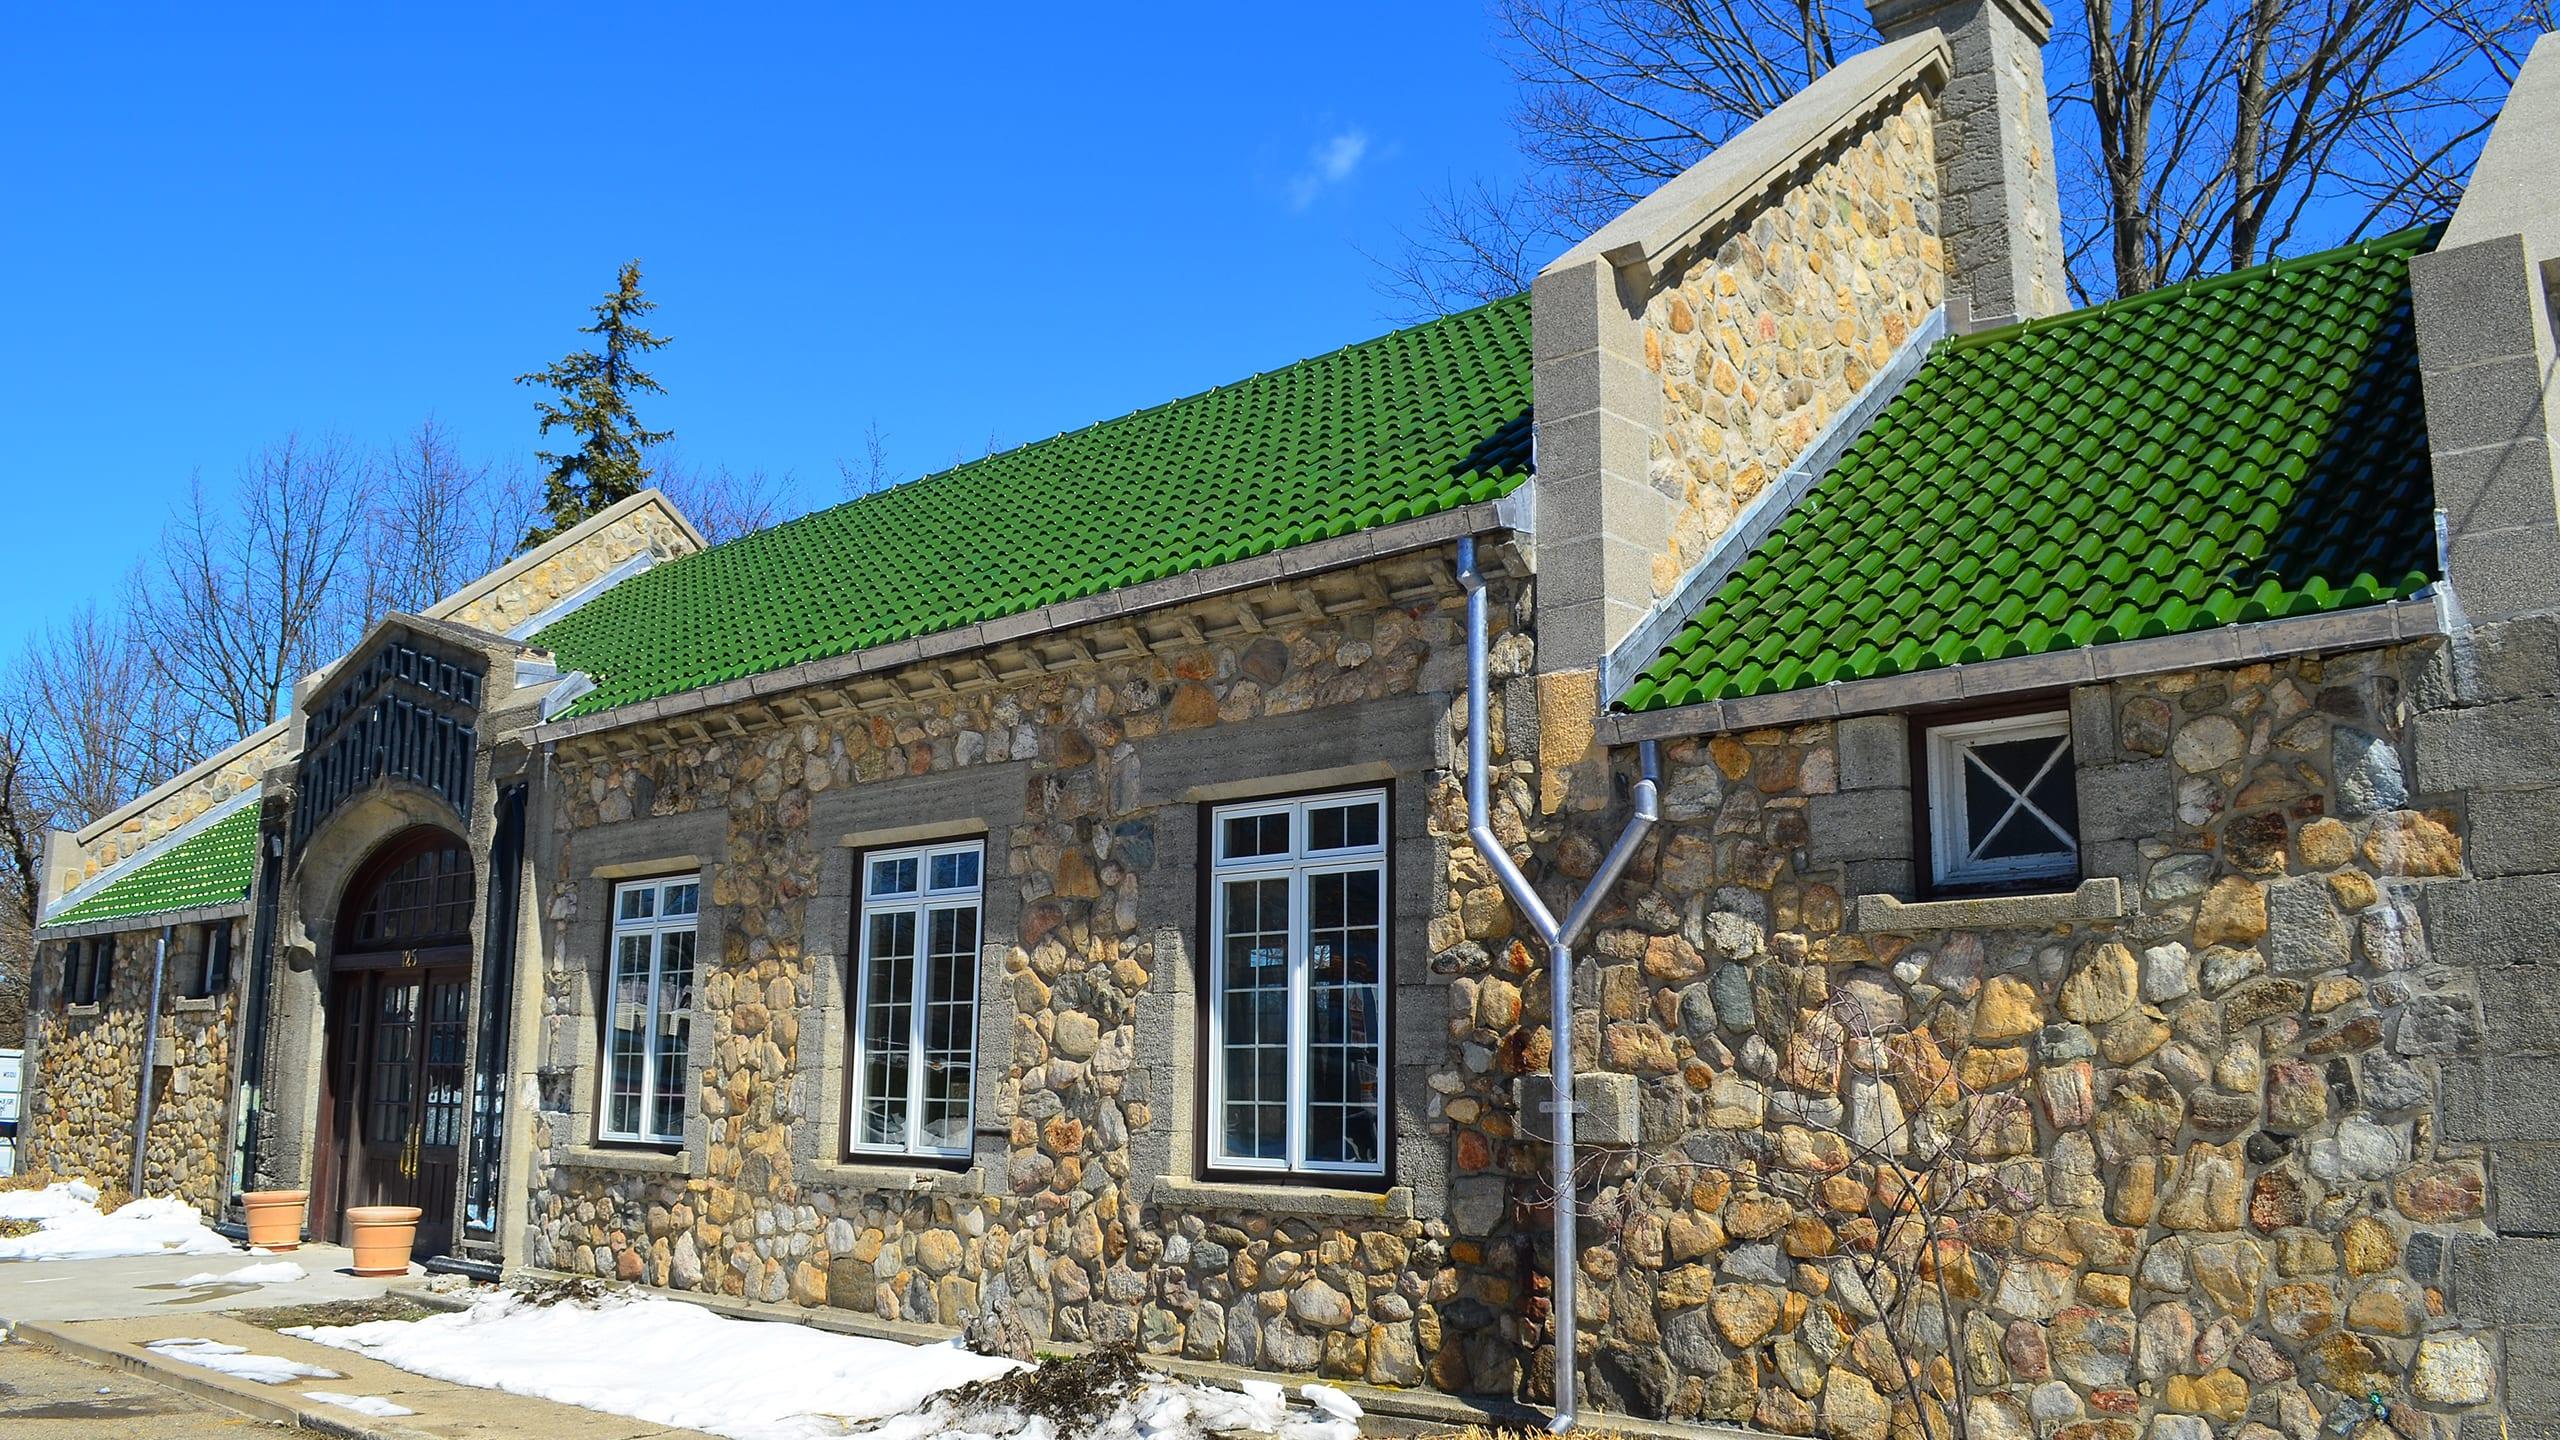 Lake Hopatcong Station Ludowici Roof Tile